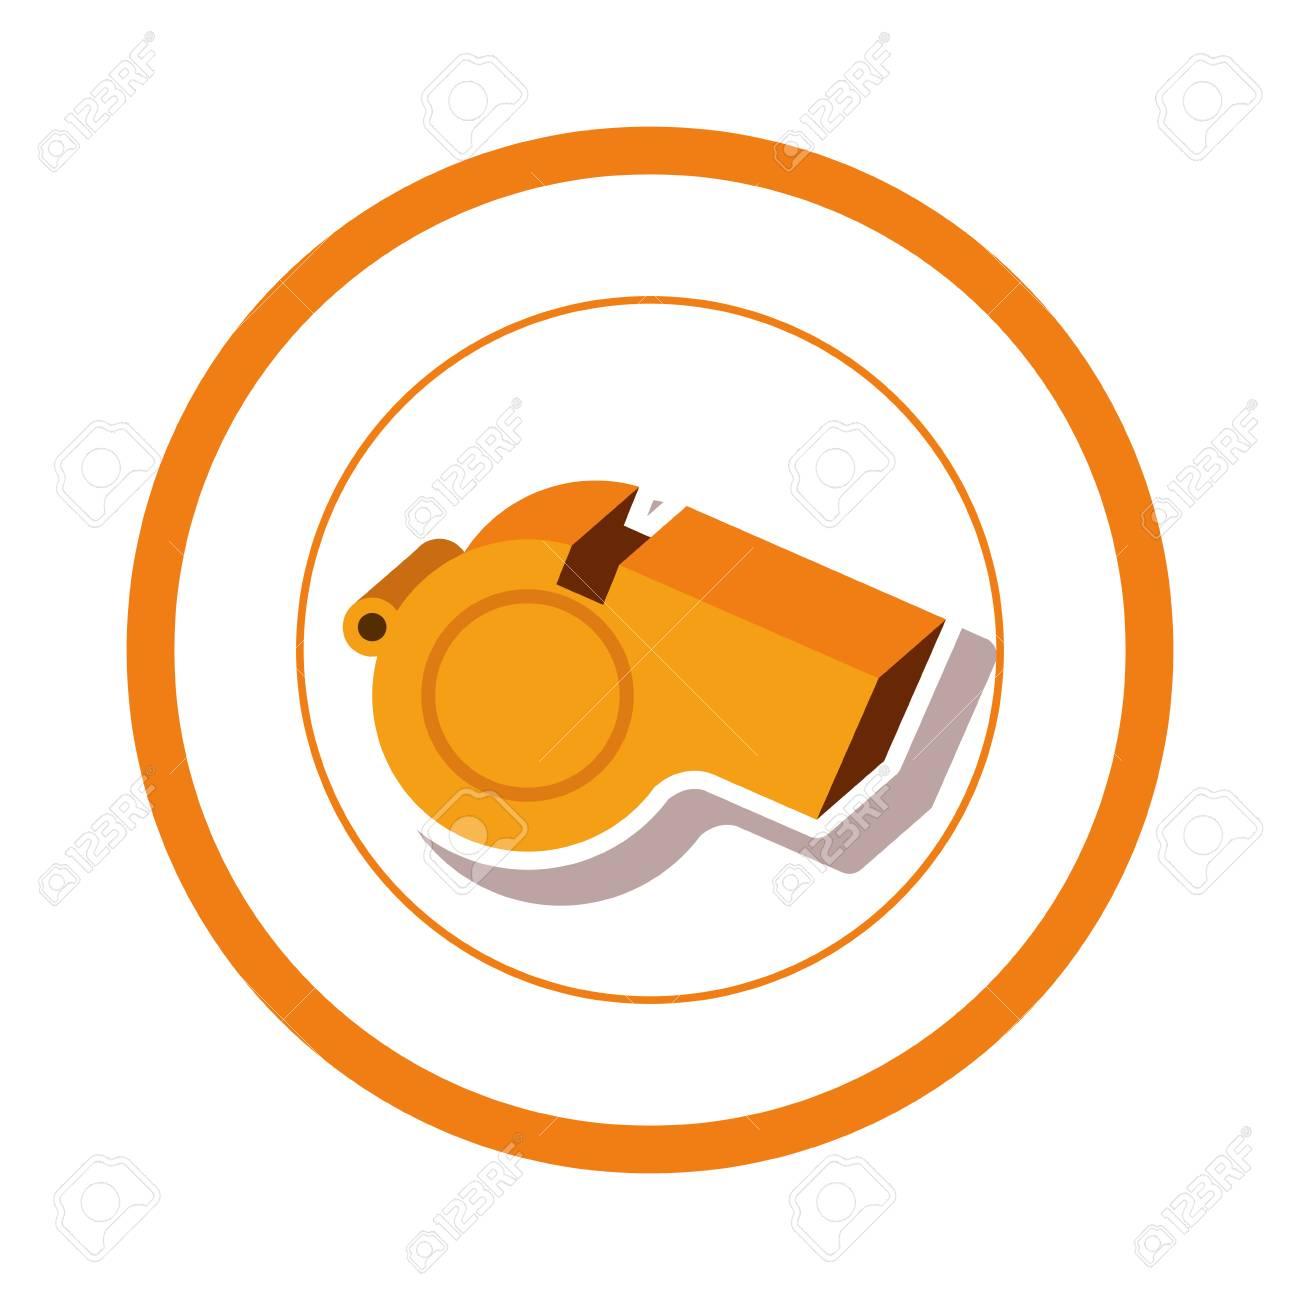 Sport whistle game icon vector illustration graphic design - 70684683